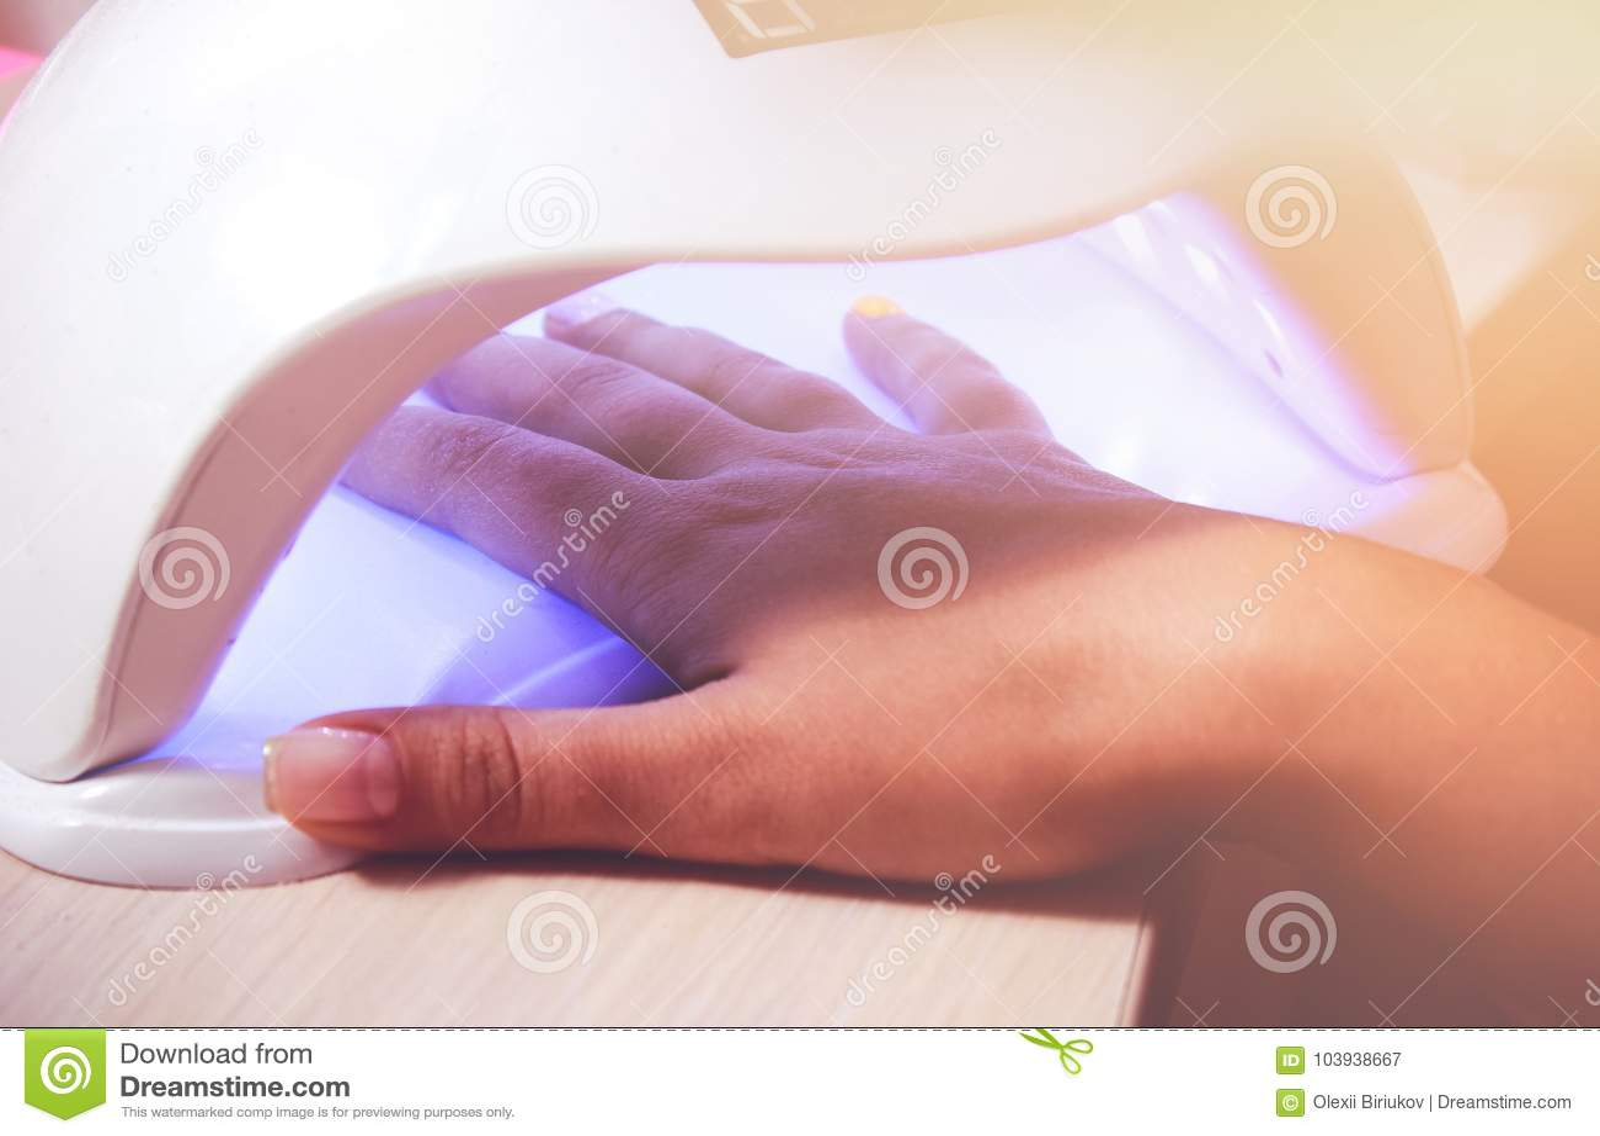 Instruments UV Lamp Gel Manicure Process In A Beauty Salon. Salon ...